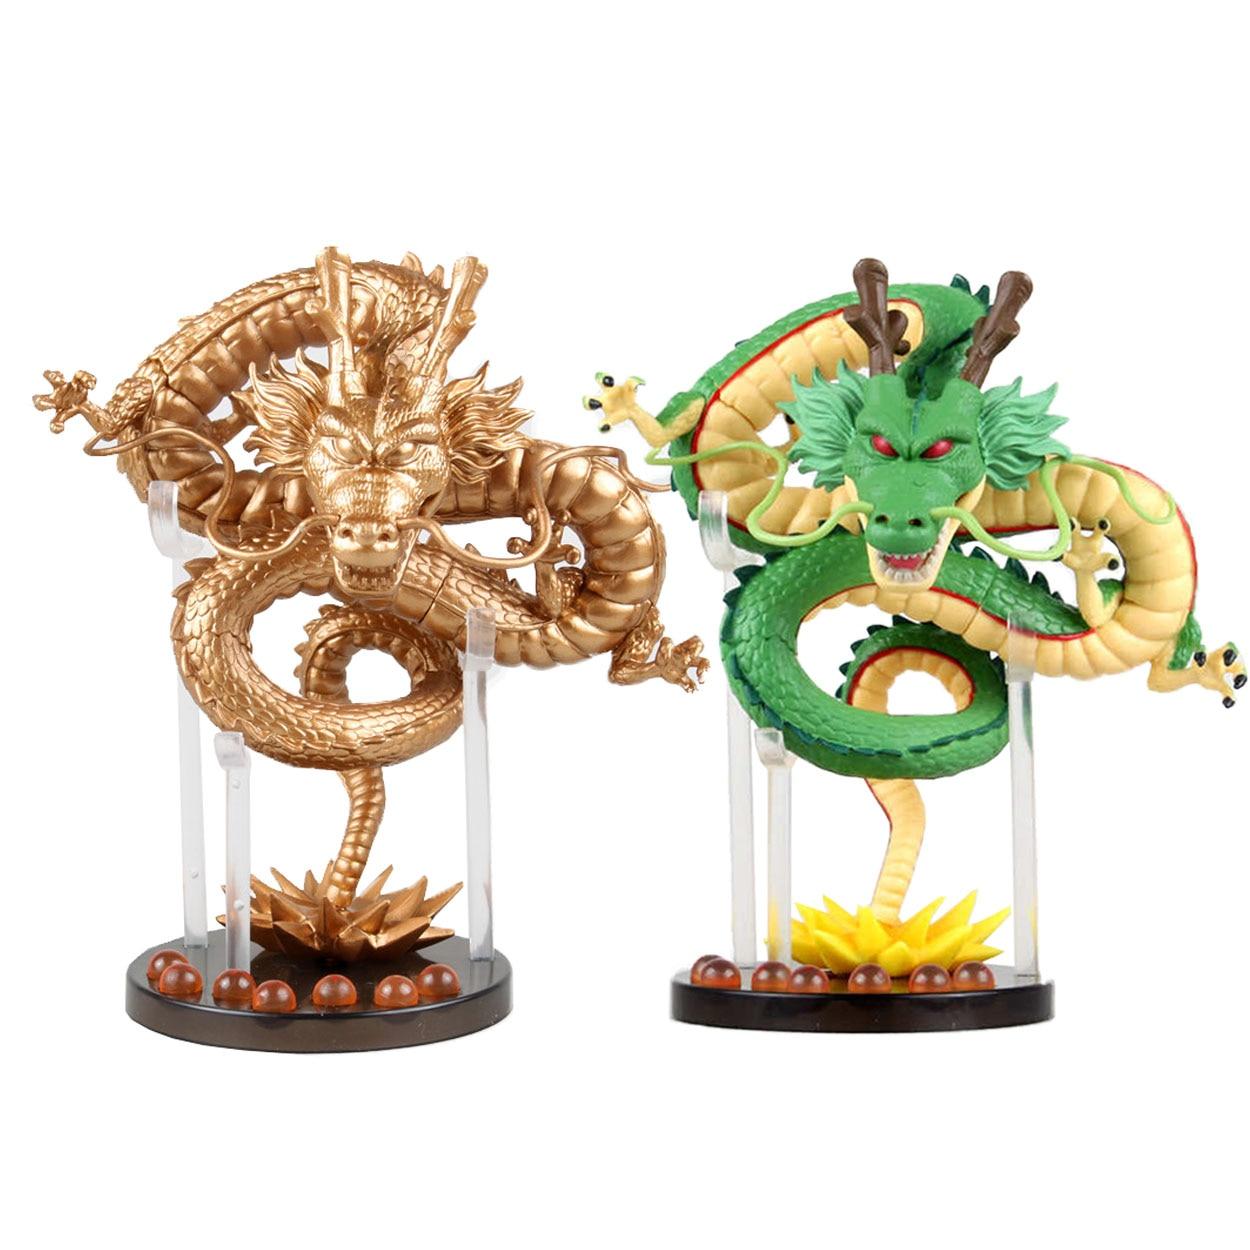 ФОТО Chanycore 16CM 19CM 1PCS/SET Two Style Gold Gree Dragon Ball Z ShenRon Son goku Resurrection 'F' Action Figure PVC toys